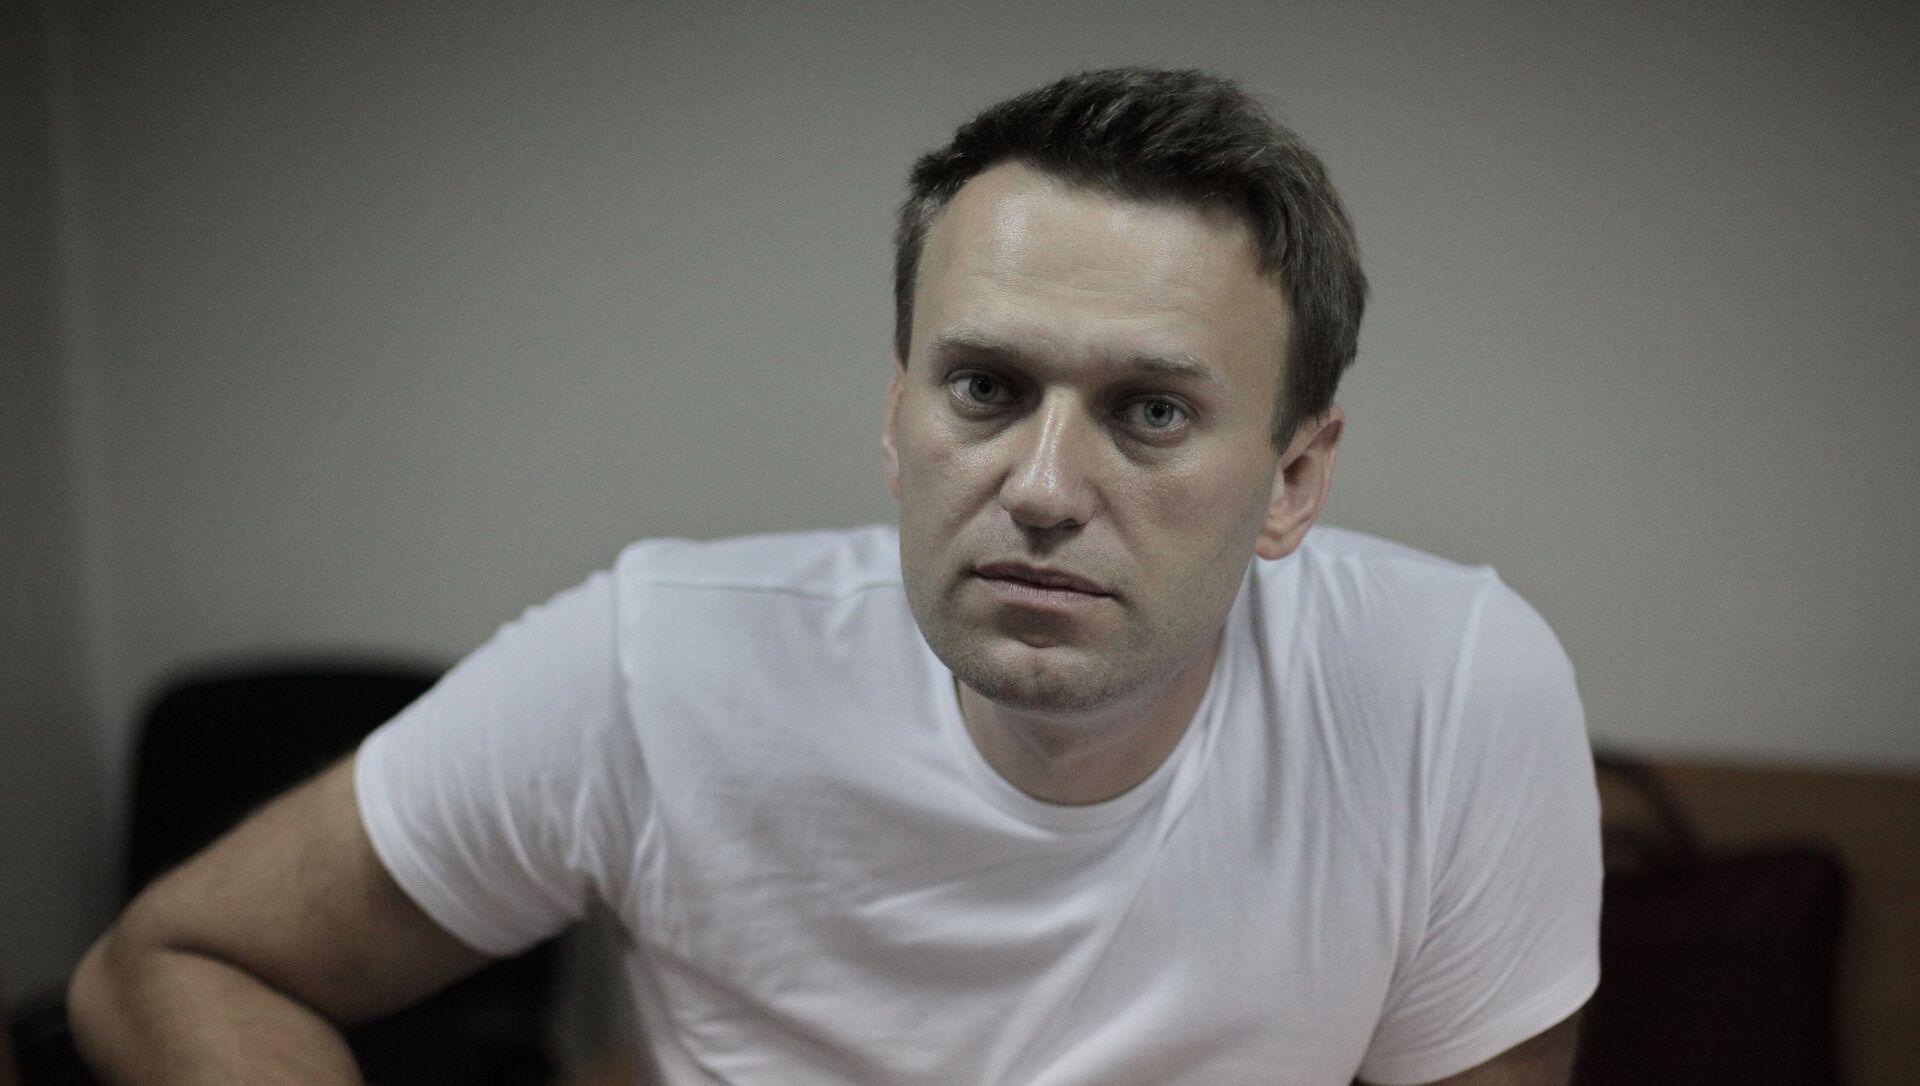 Alexéi Navalni, opositor ruso - Sputnik Mundo, 1920, 22.12.2020